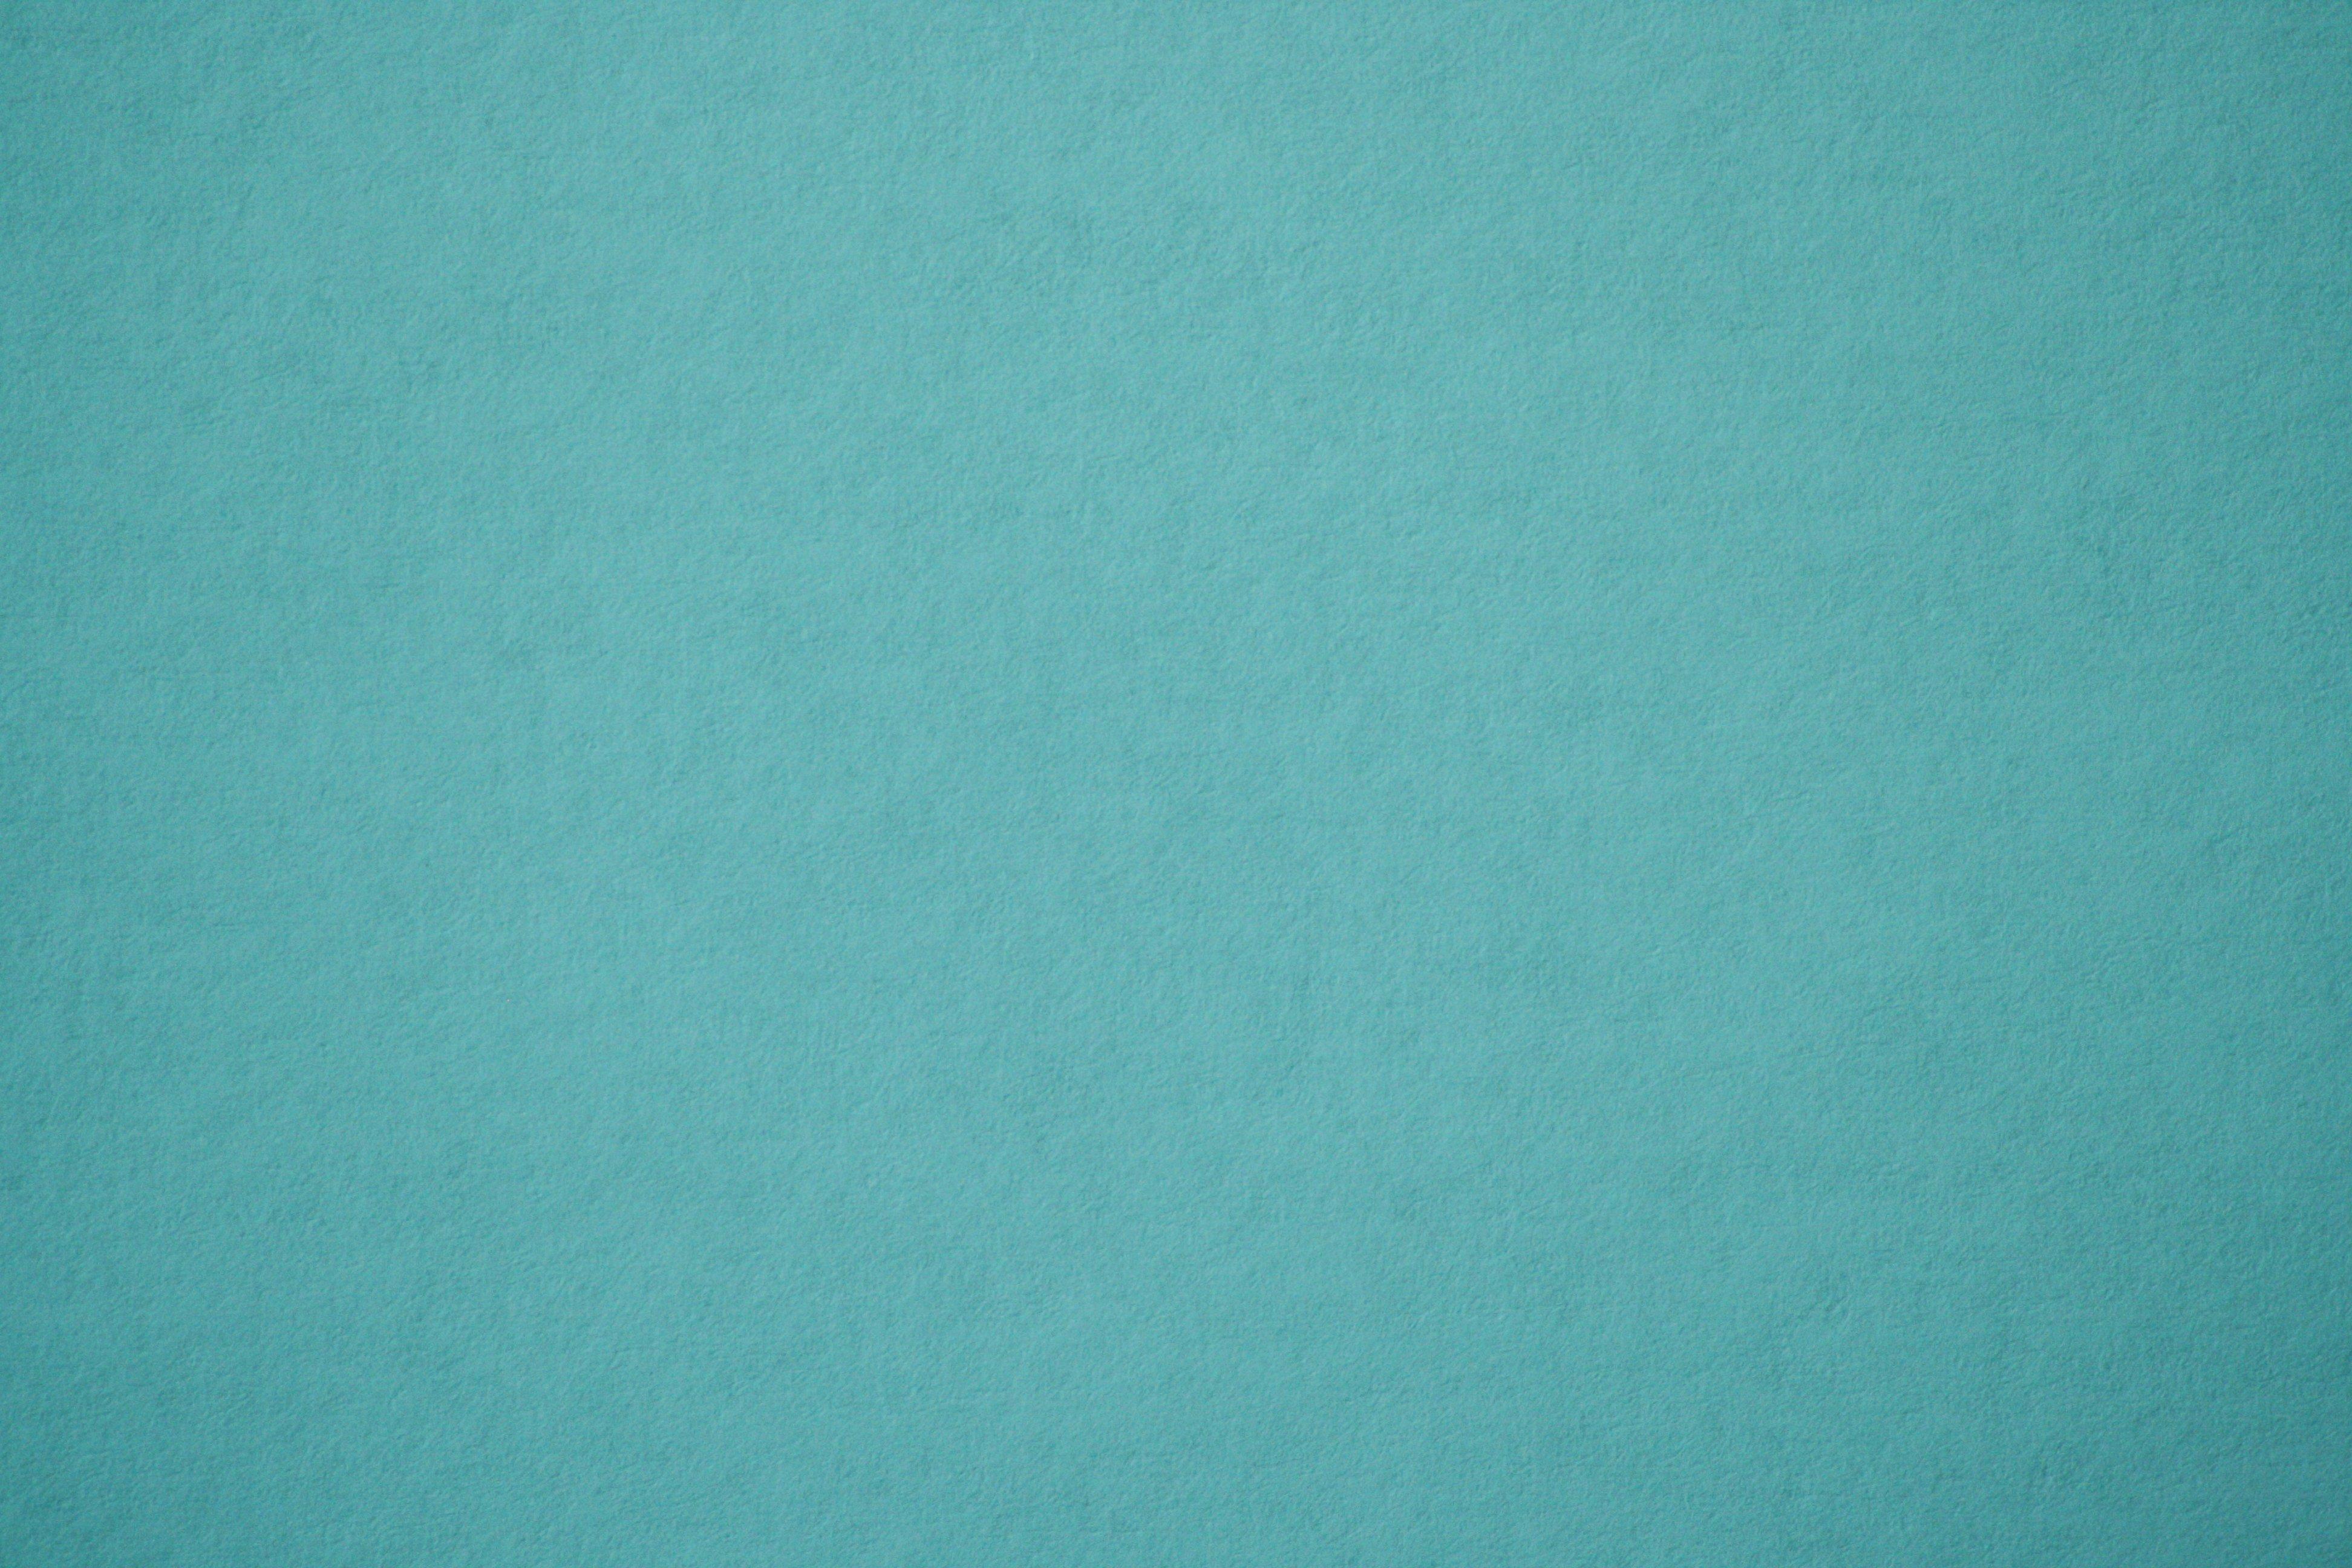 teal paper texture picture free photograph photos public domain